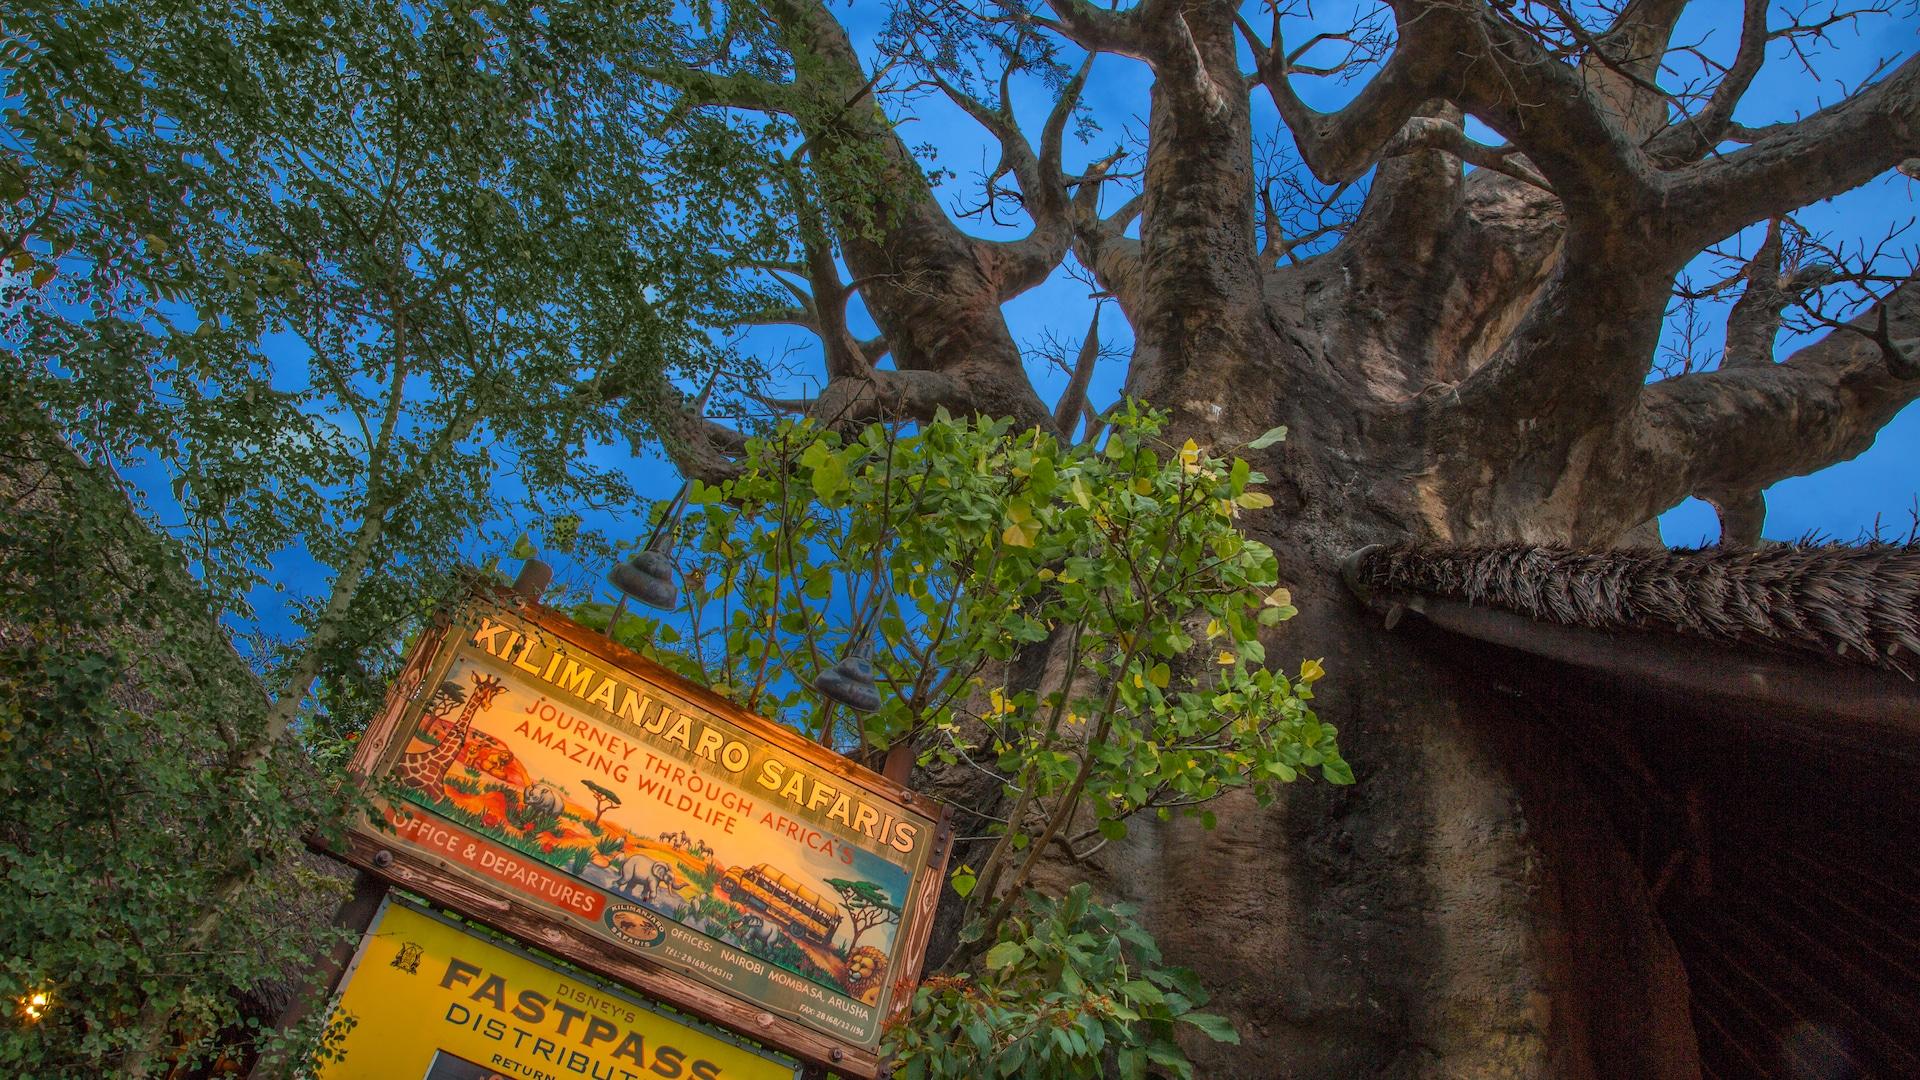 Kilimanjaro Safaris FastPass+